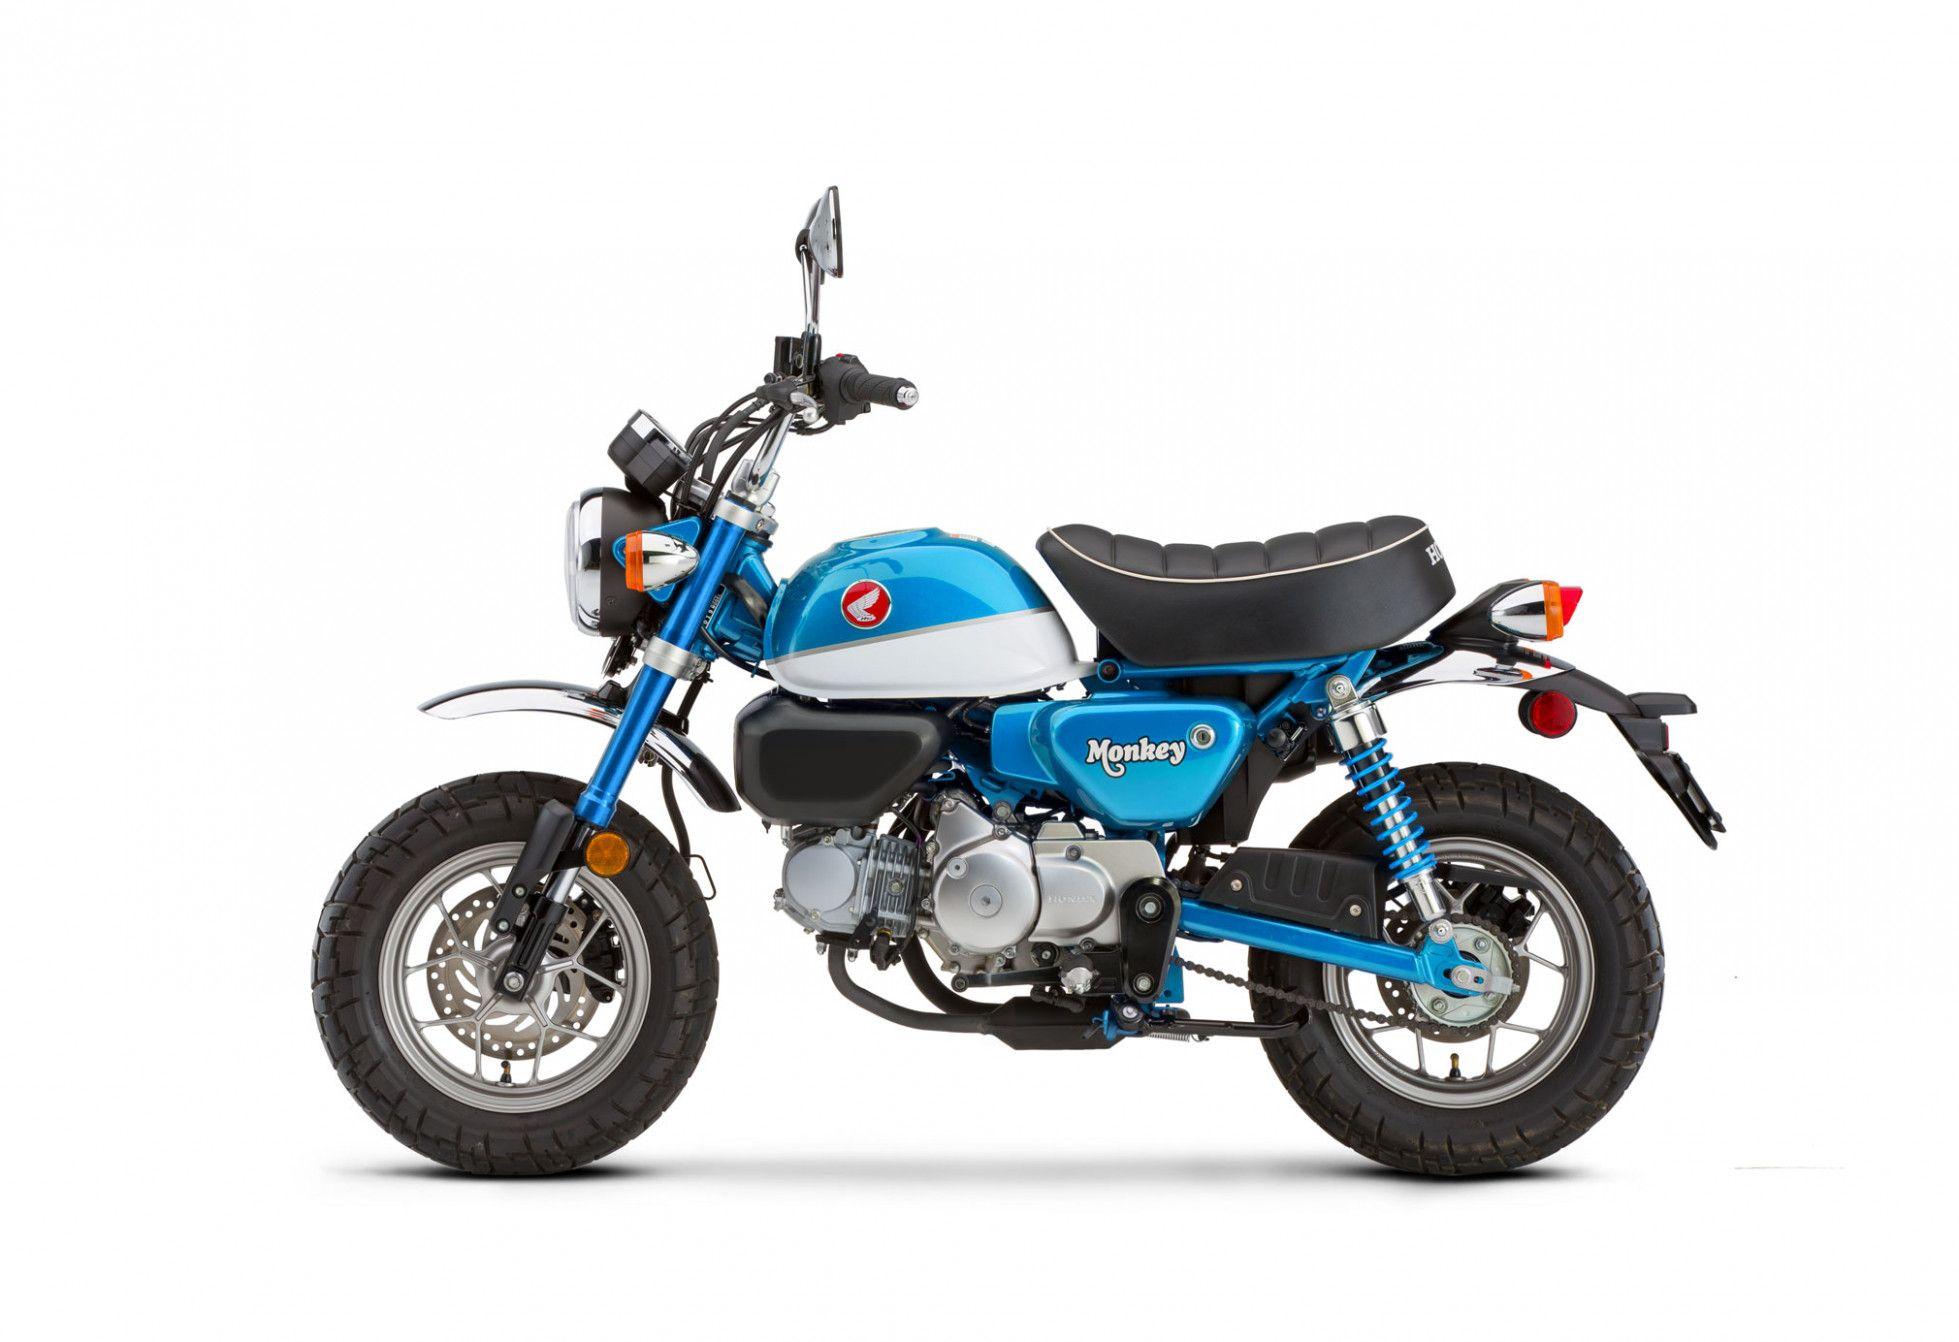 6 Picture 2020 Honda Z50 For Sale In 2020 Monkeys For Sale Honda Motorcycle